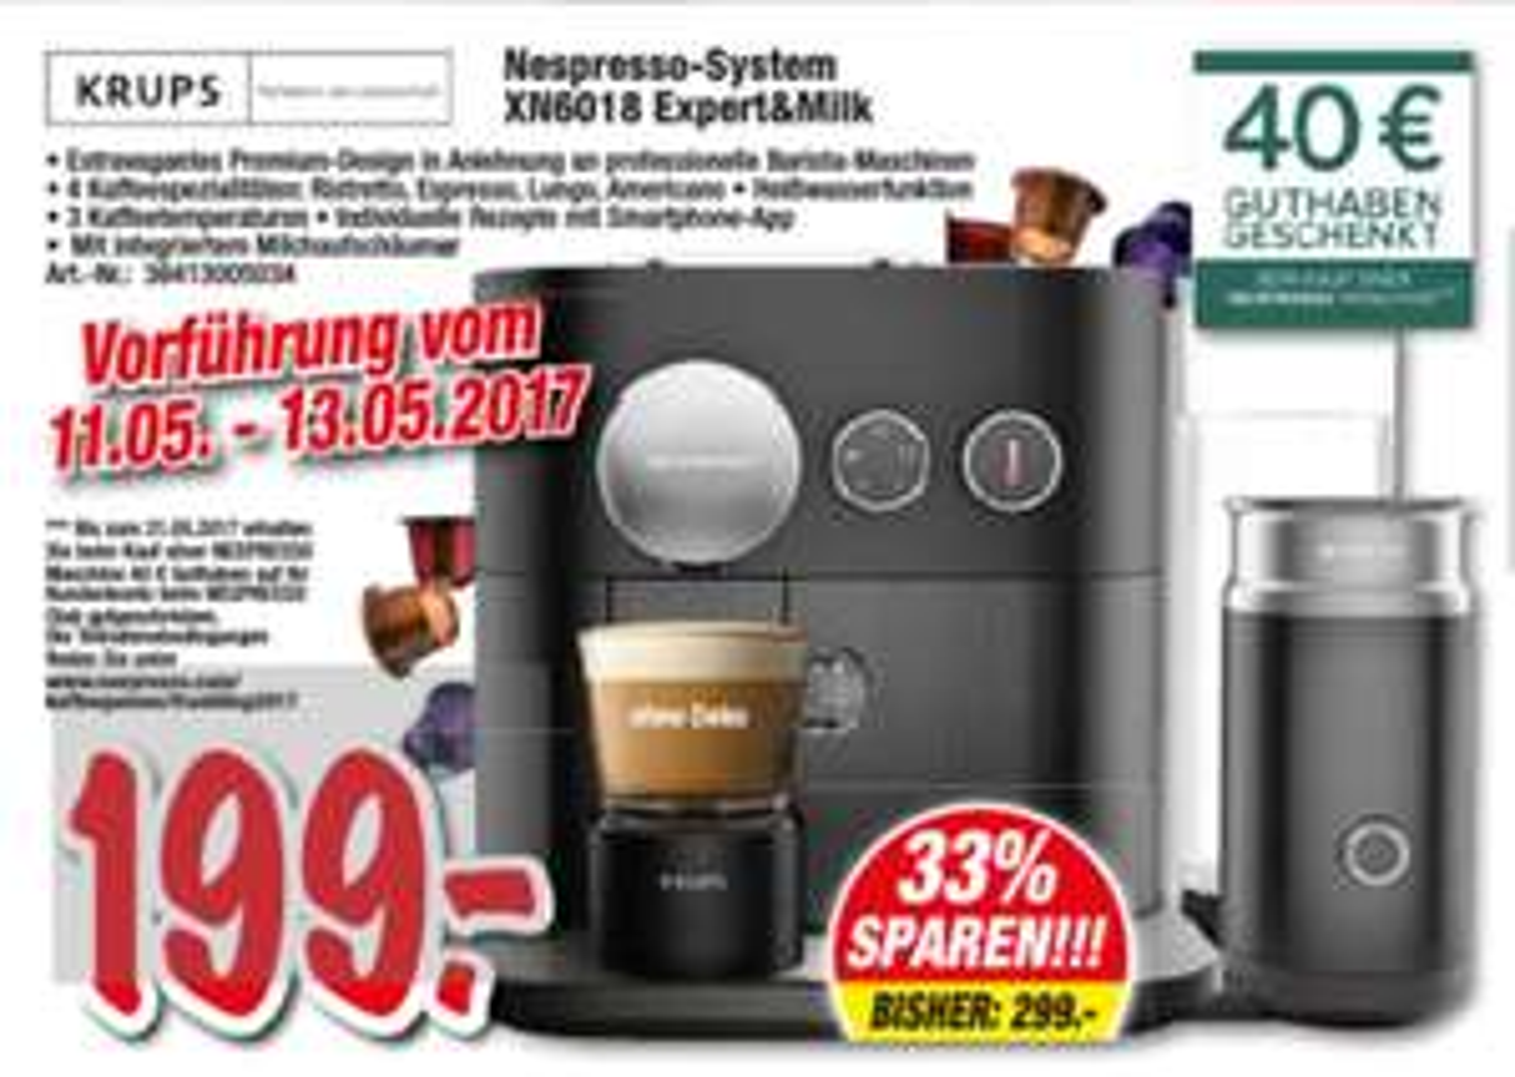 [lokal] Krups Nespresso XN6018 Expert & Milk @Technoland Deizisau